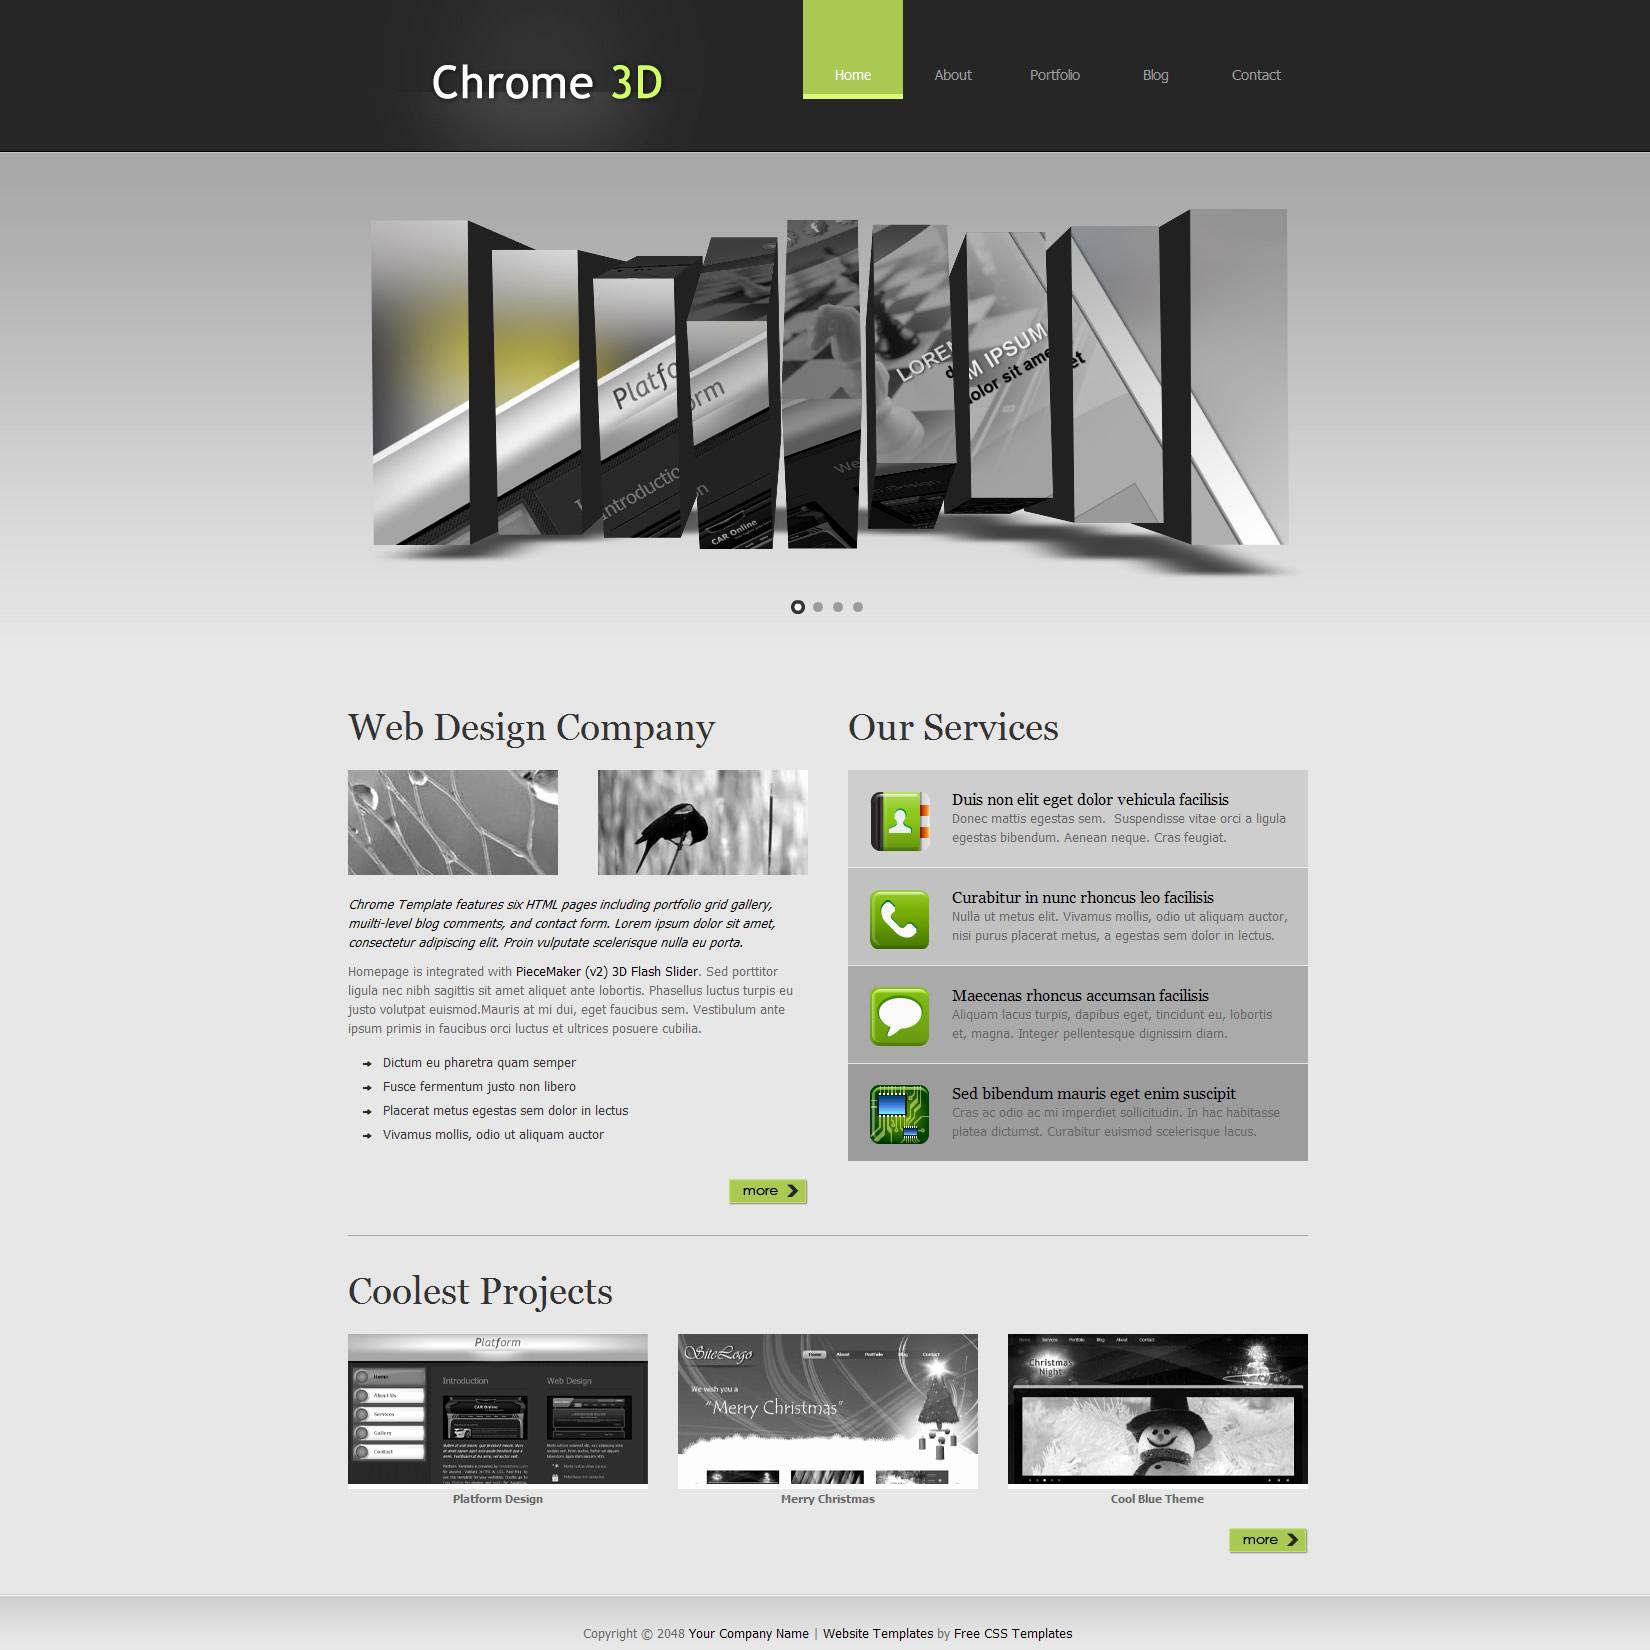 Dream Weaver Web Templates Beautiful Free Template 281 Chrome